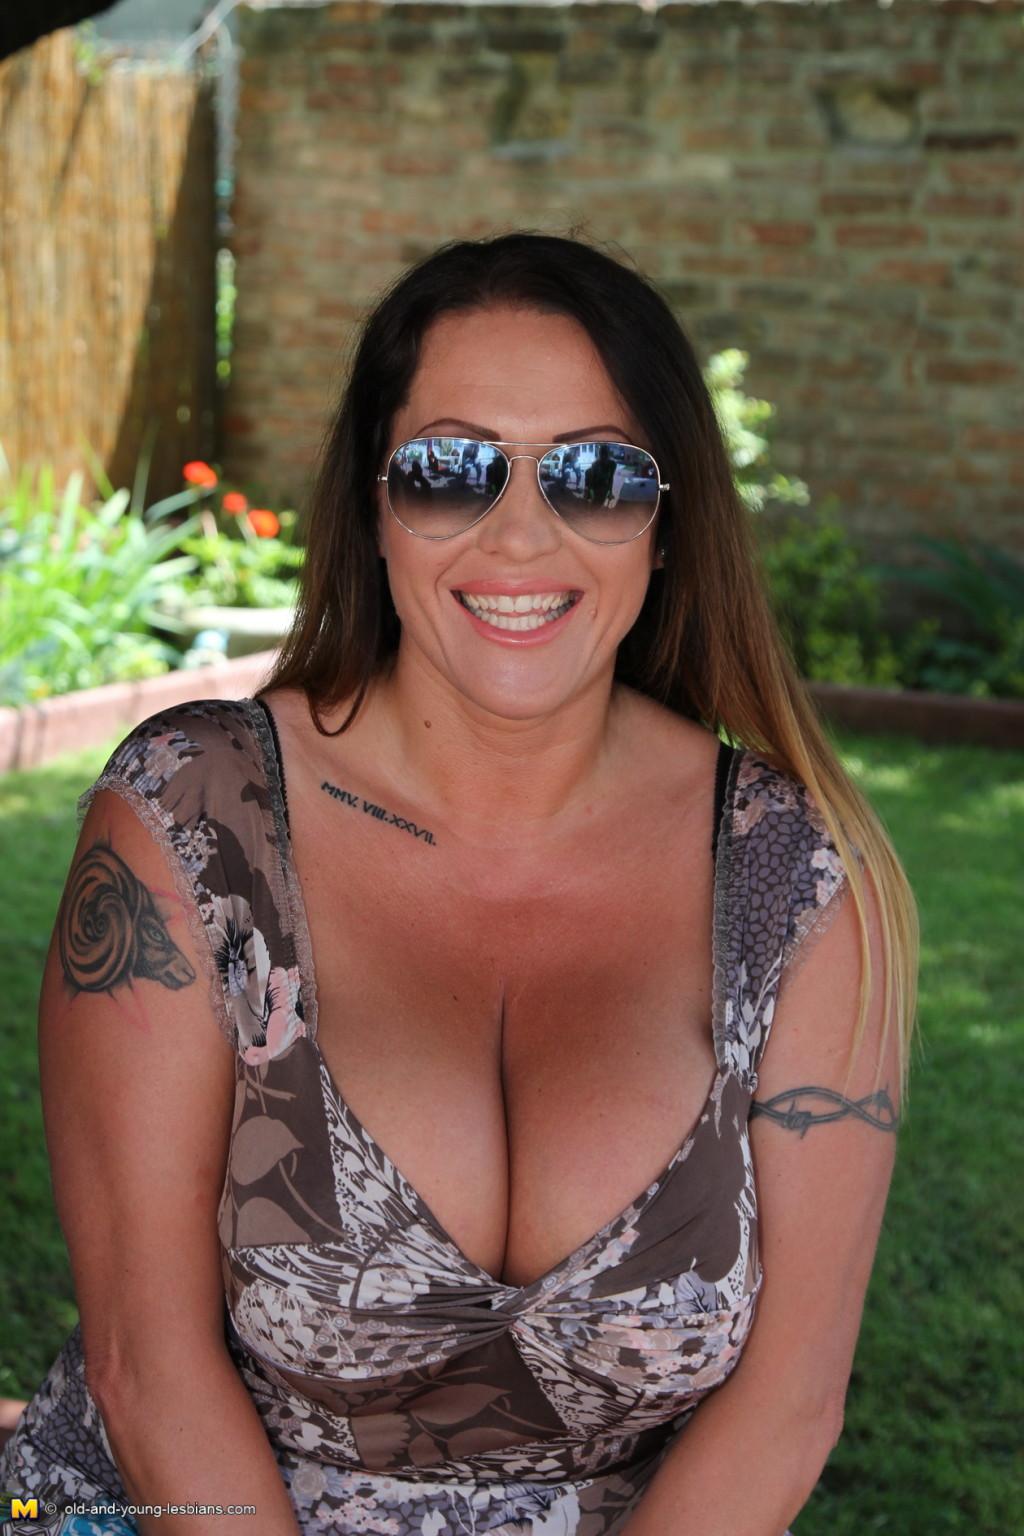 Big Tit Blonde Stepmom Pov